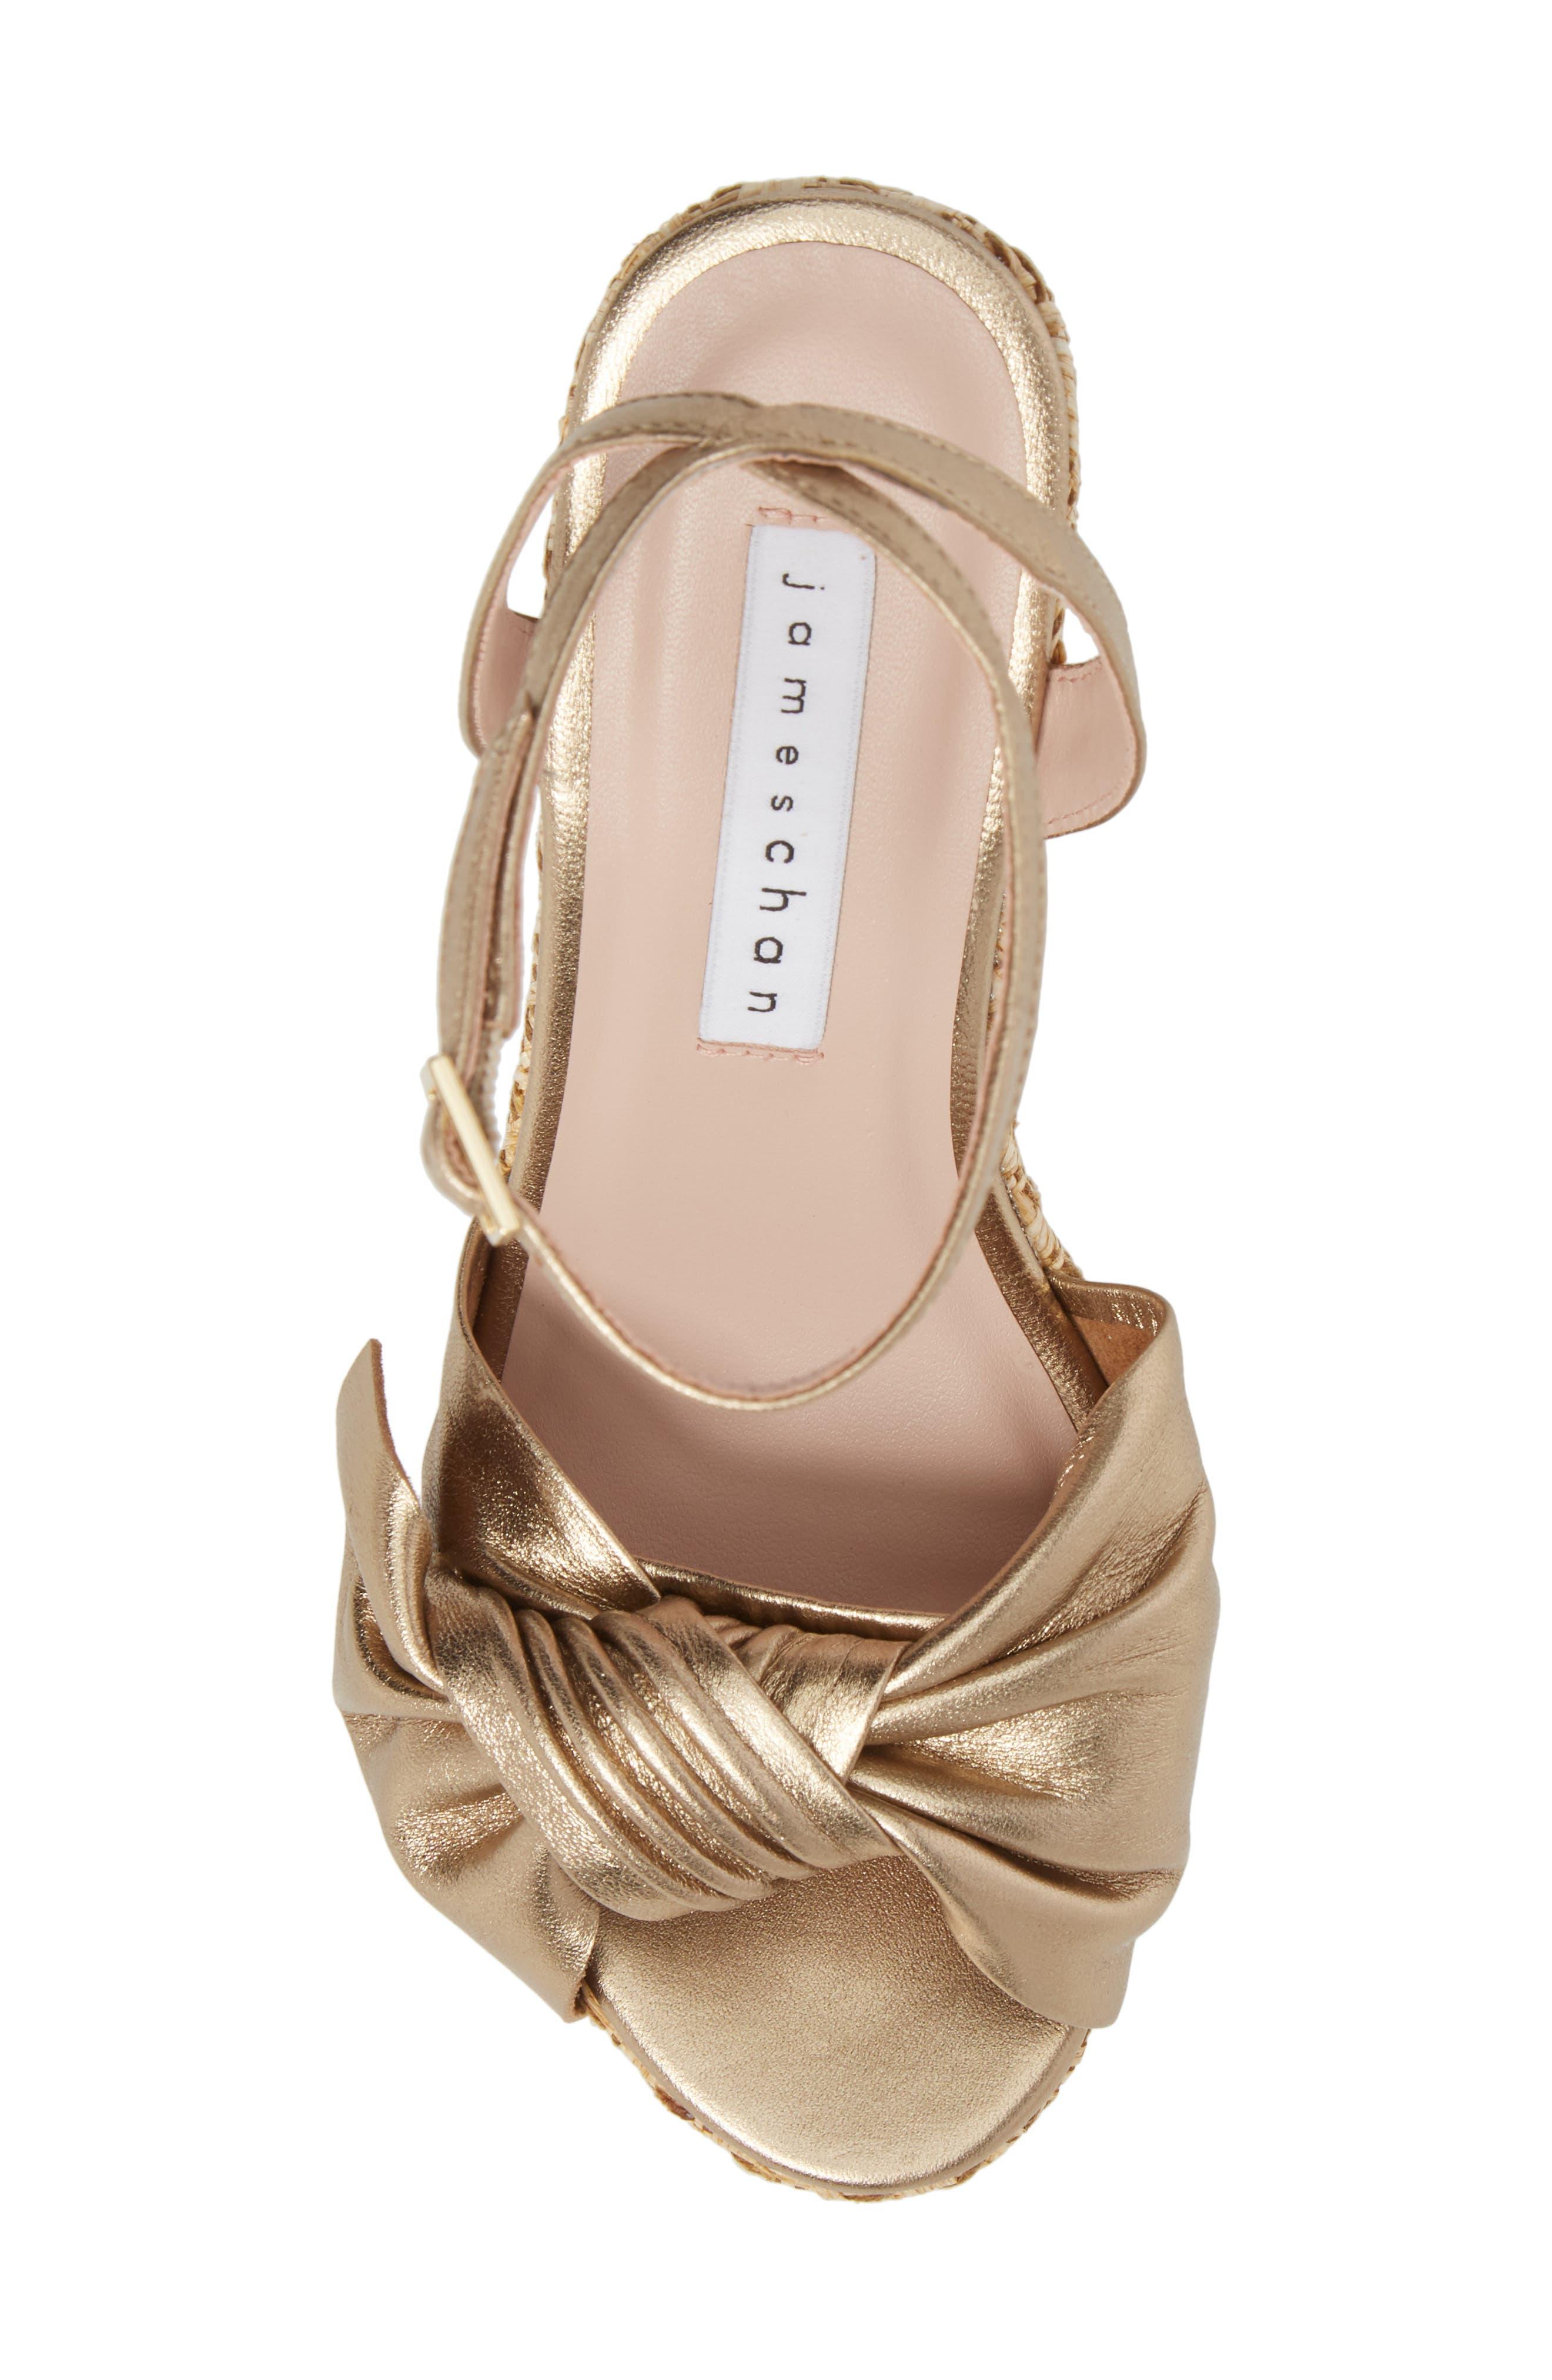 Pinky Platform Sandal,                             Alternate thumbnail 5, color,                             Dark Gold Suede